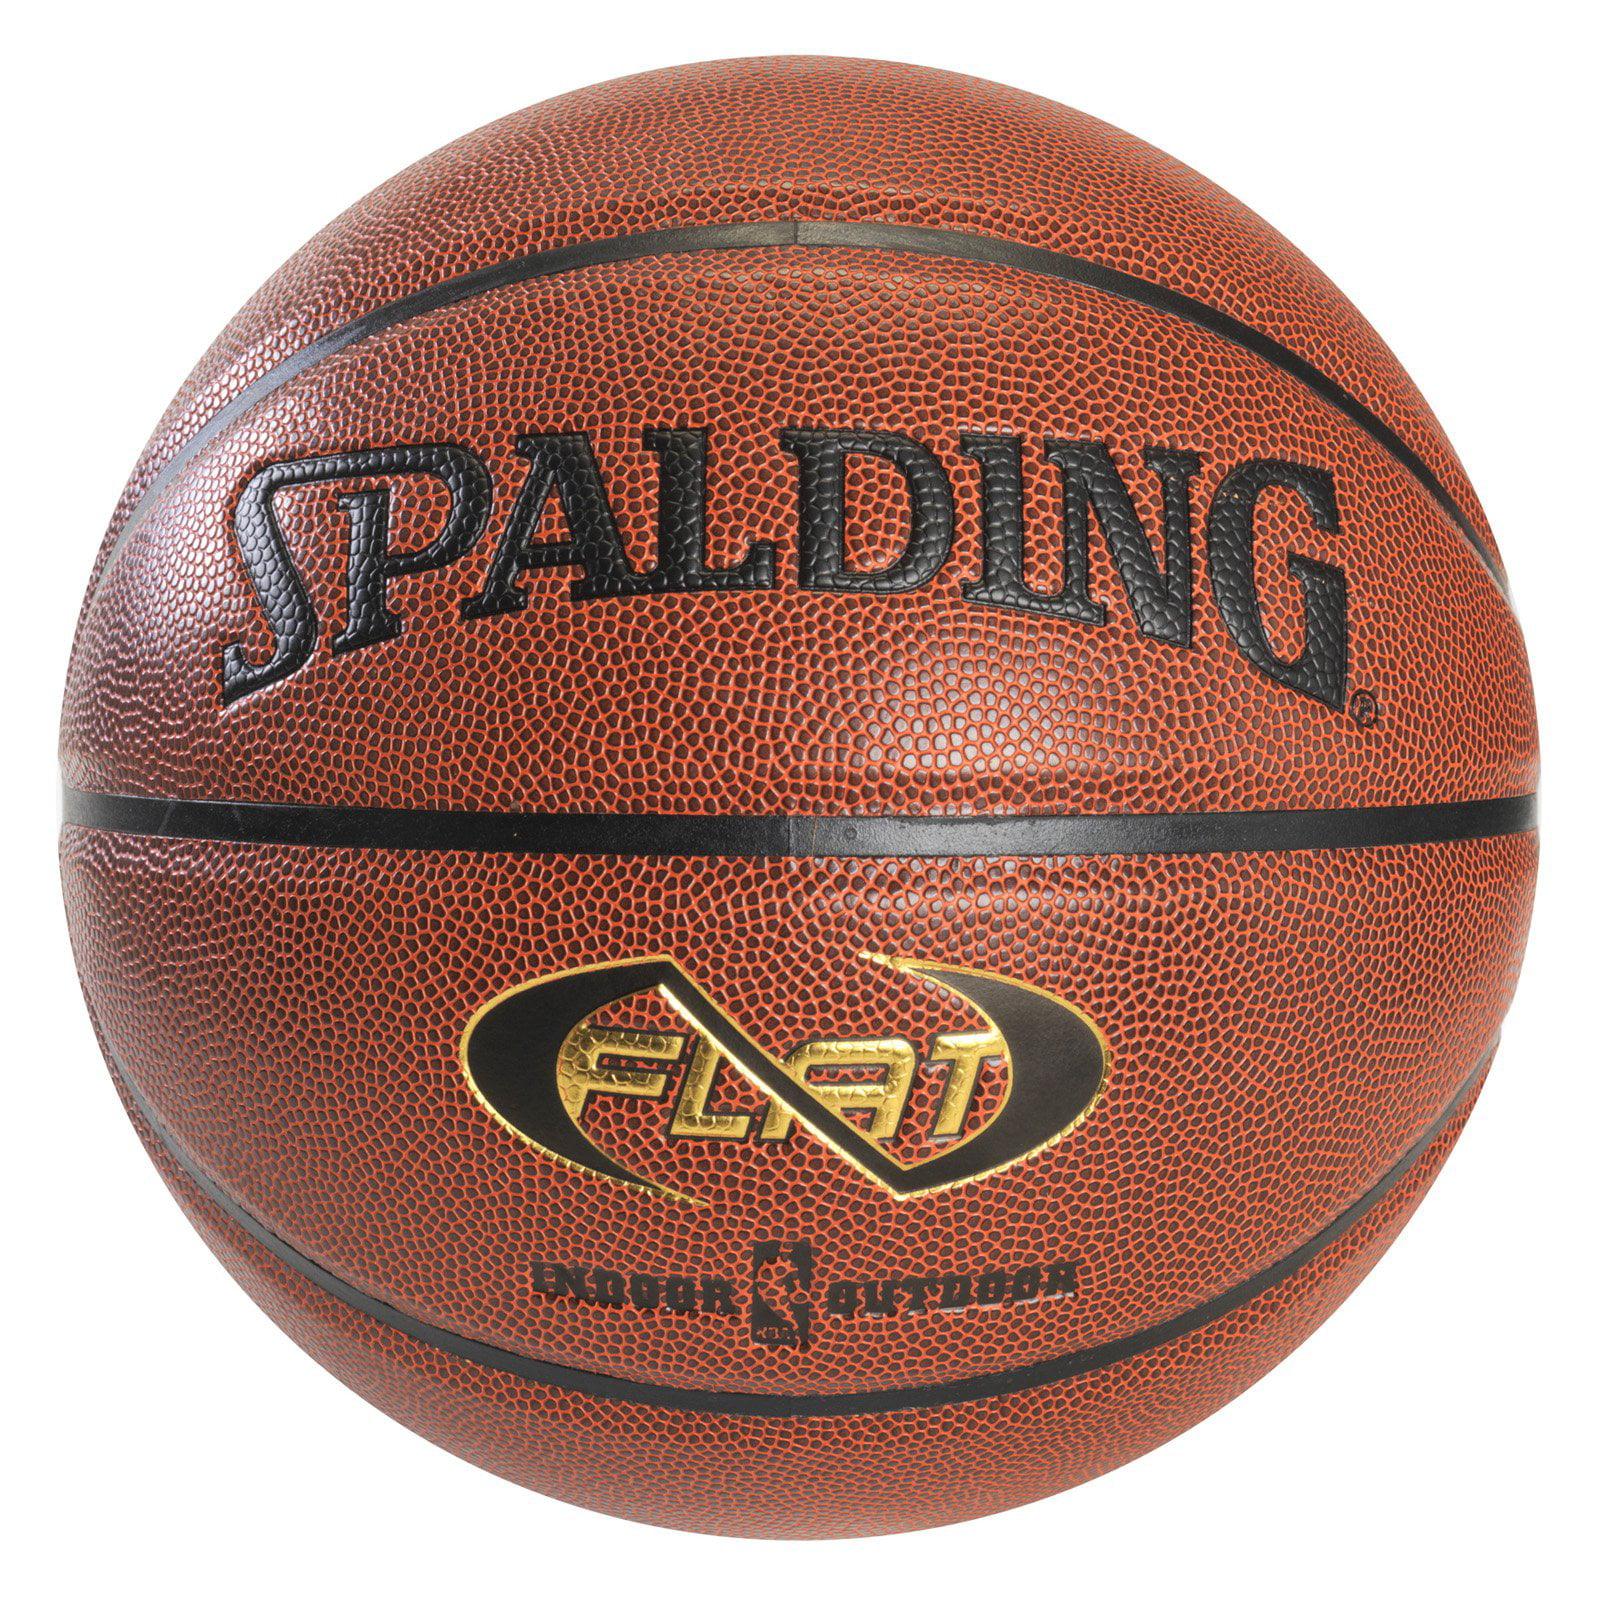 Spalding Neverflat Composite Basketball Size 7 by Spalding